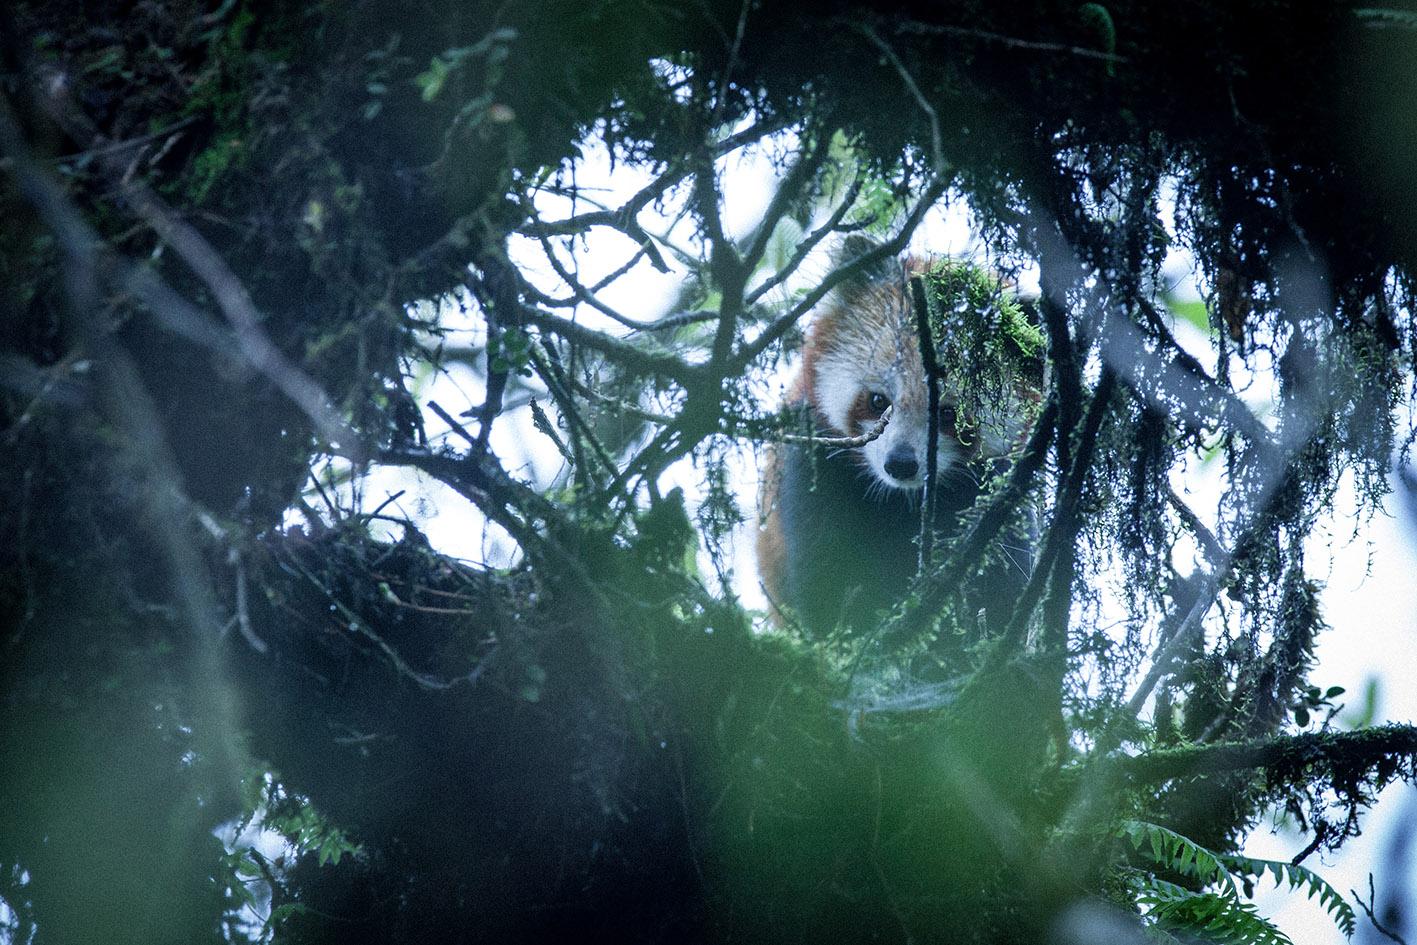 red panda roux mazille wildlife photographer arte aventures en terre animale 6.jpg